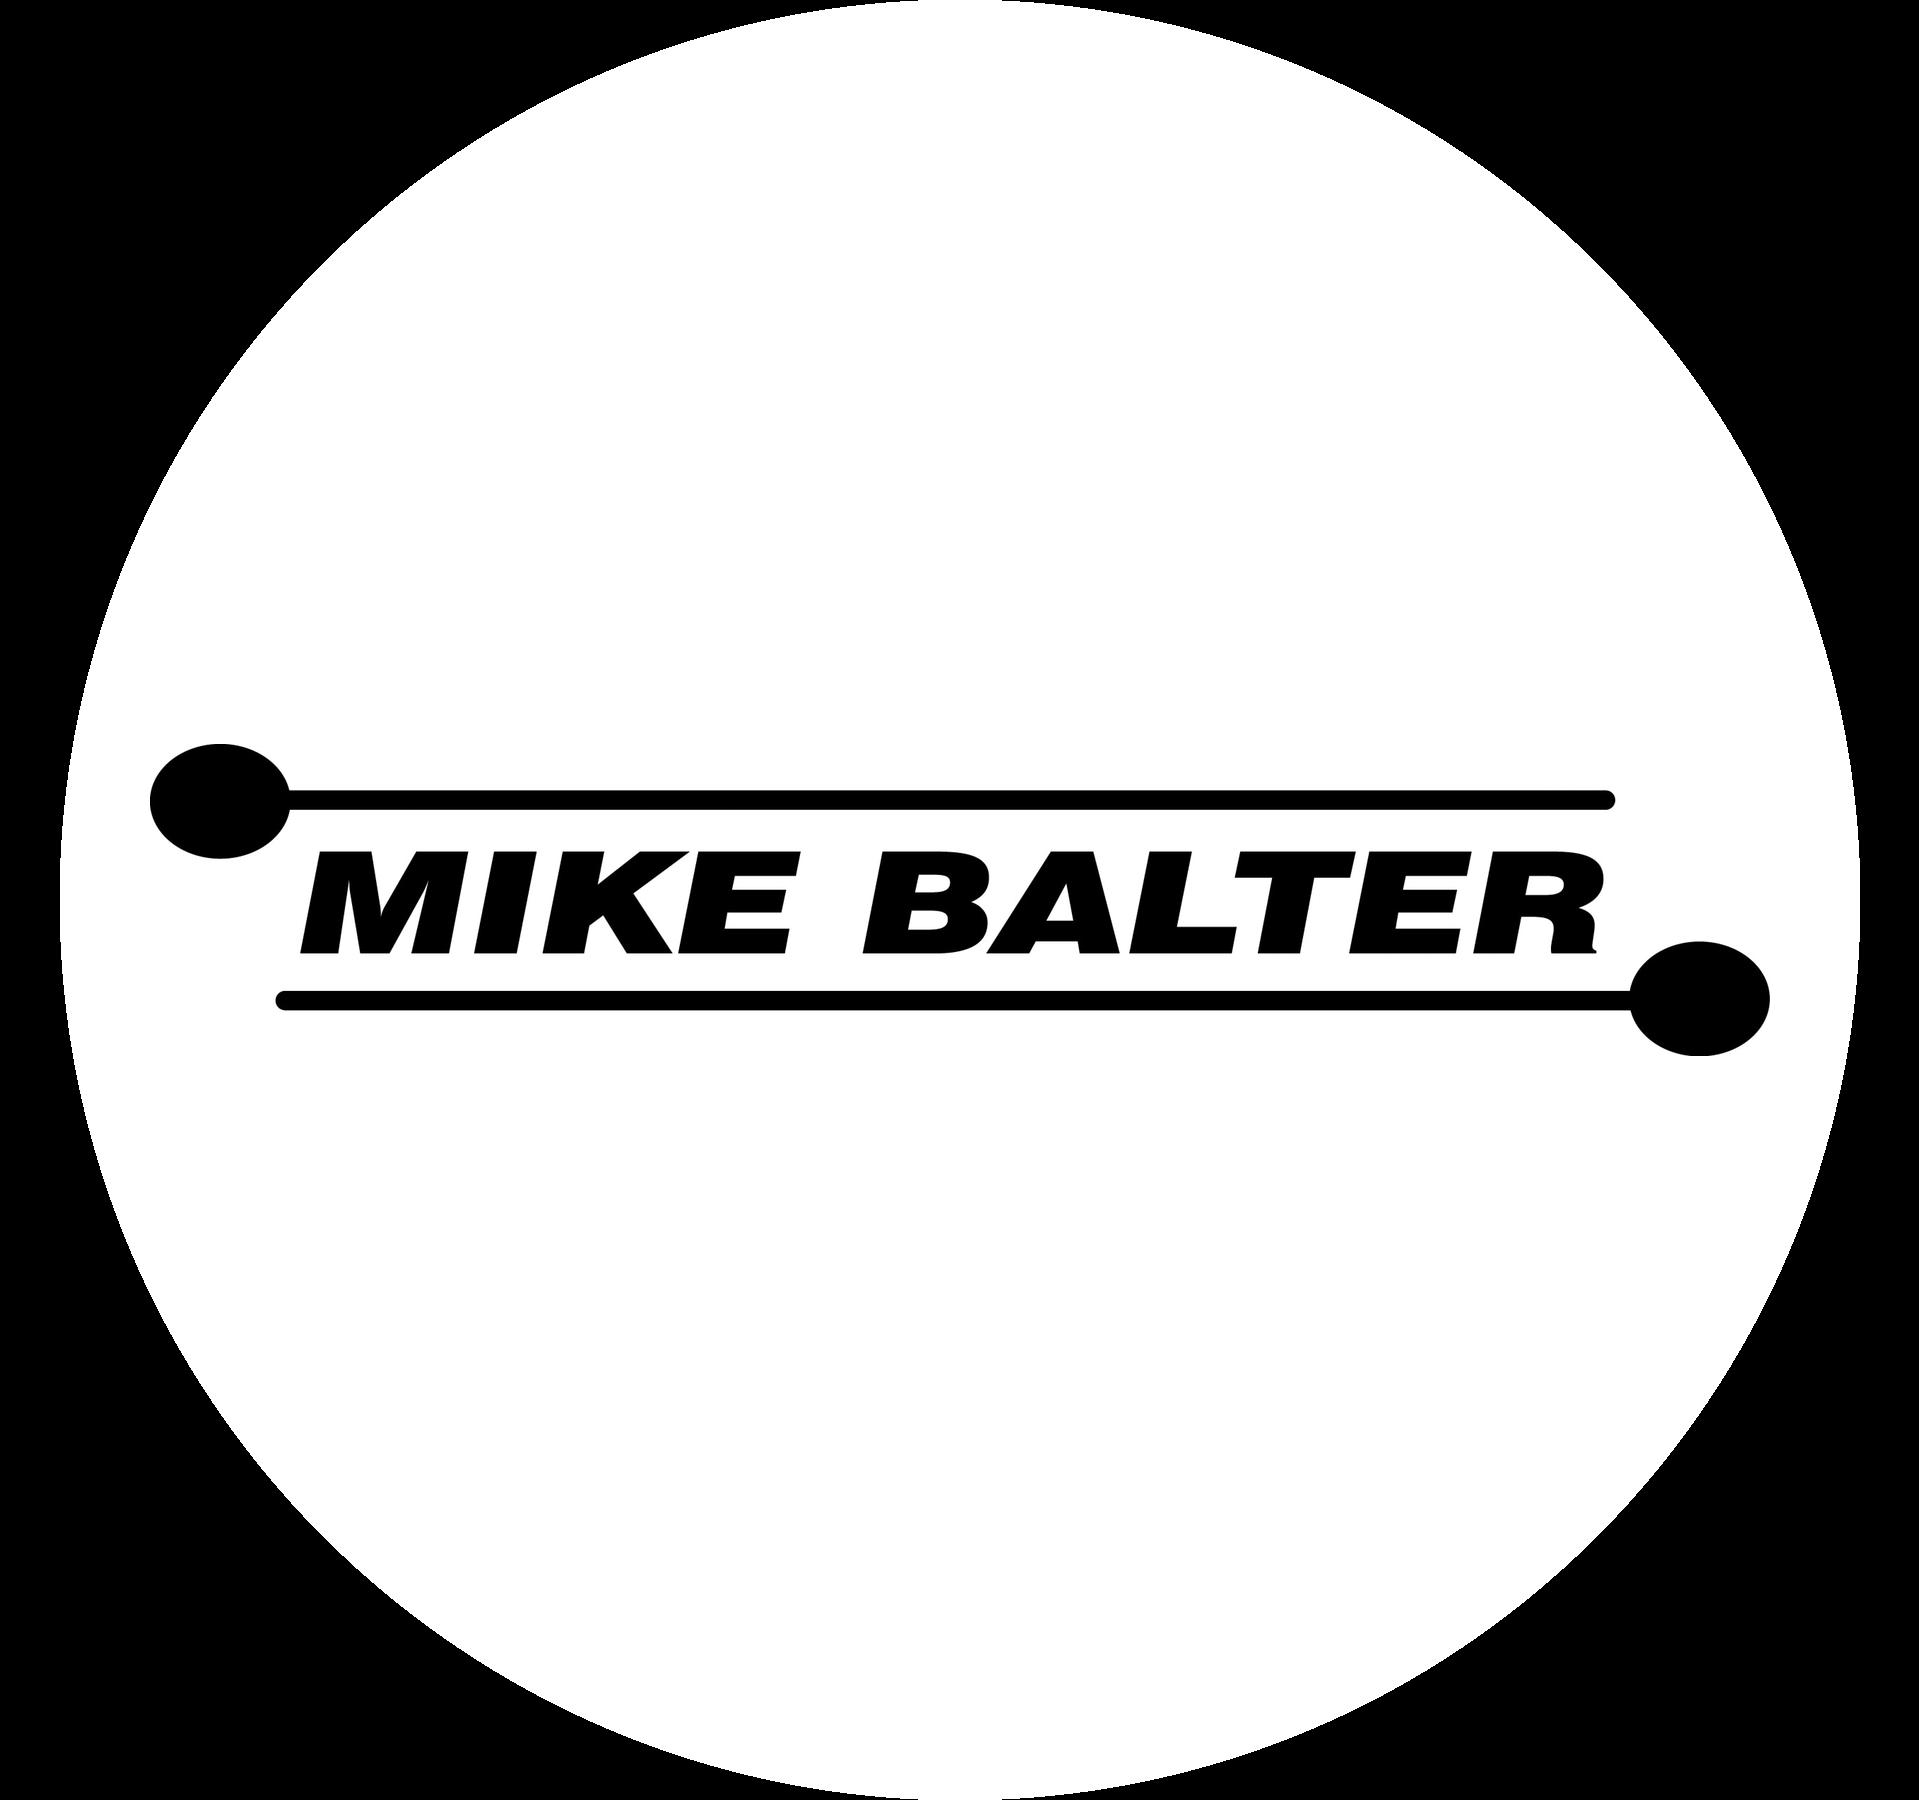 mikebalter.png